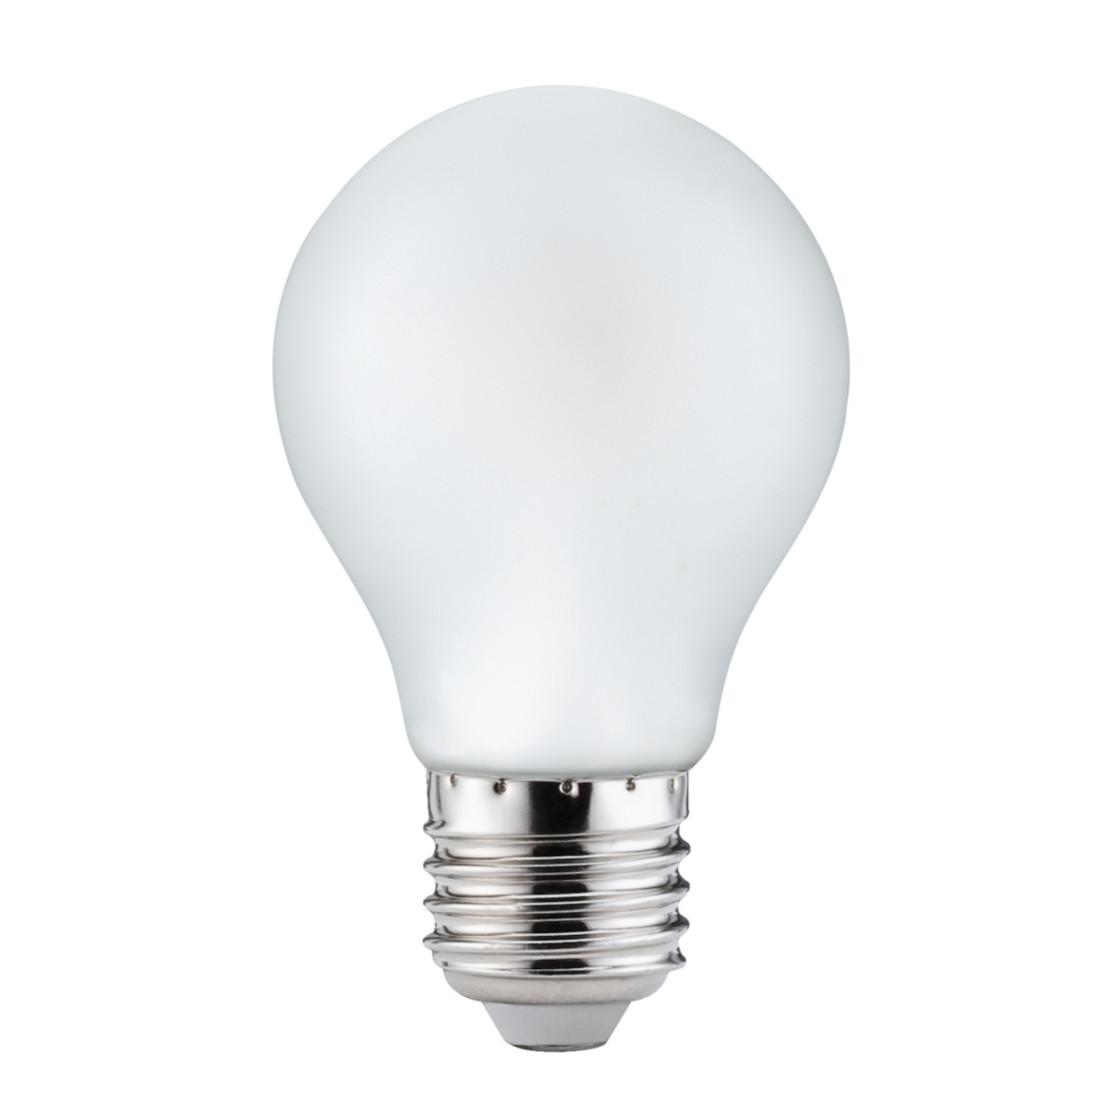 paulmann led agl 2 5 w e27 warmwei satin lampen rampe de 2 99. Black Bedroom Furniture Sets. Home Design Ideas